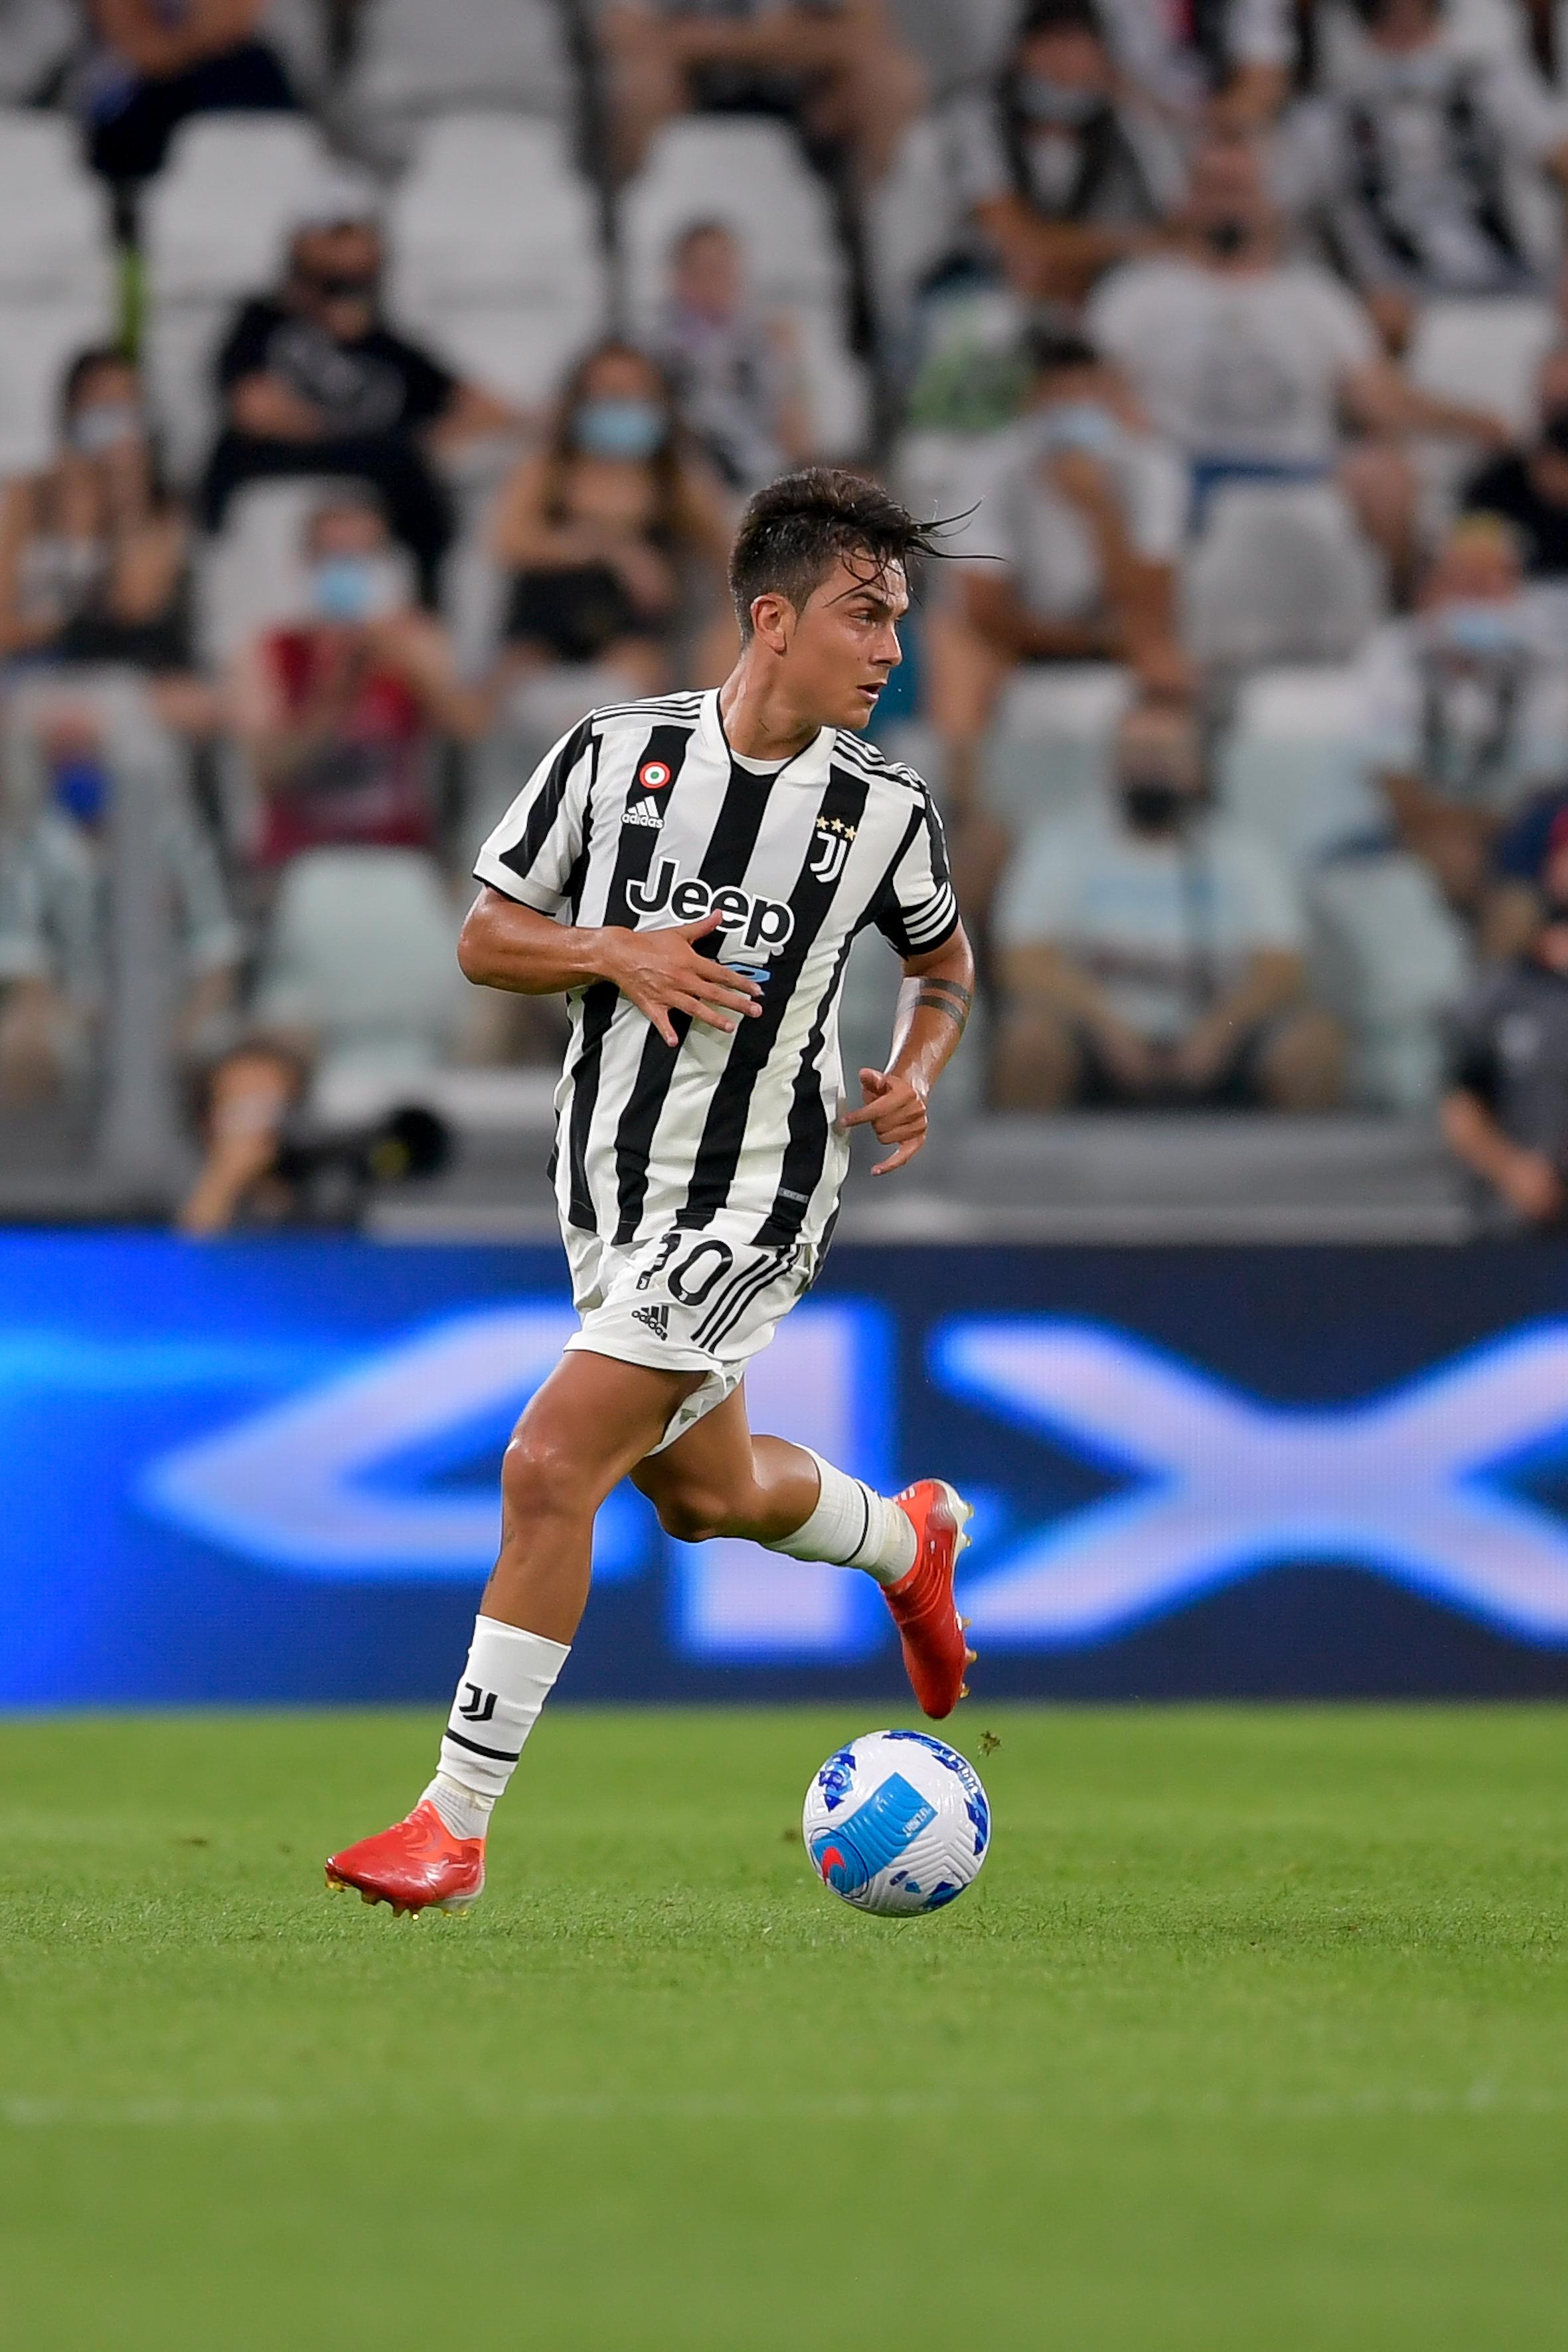 Juventus v Atalanta - Pre-Season Friendly